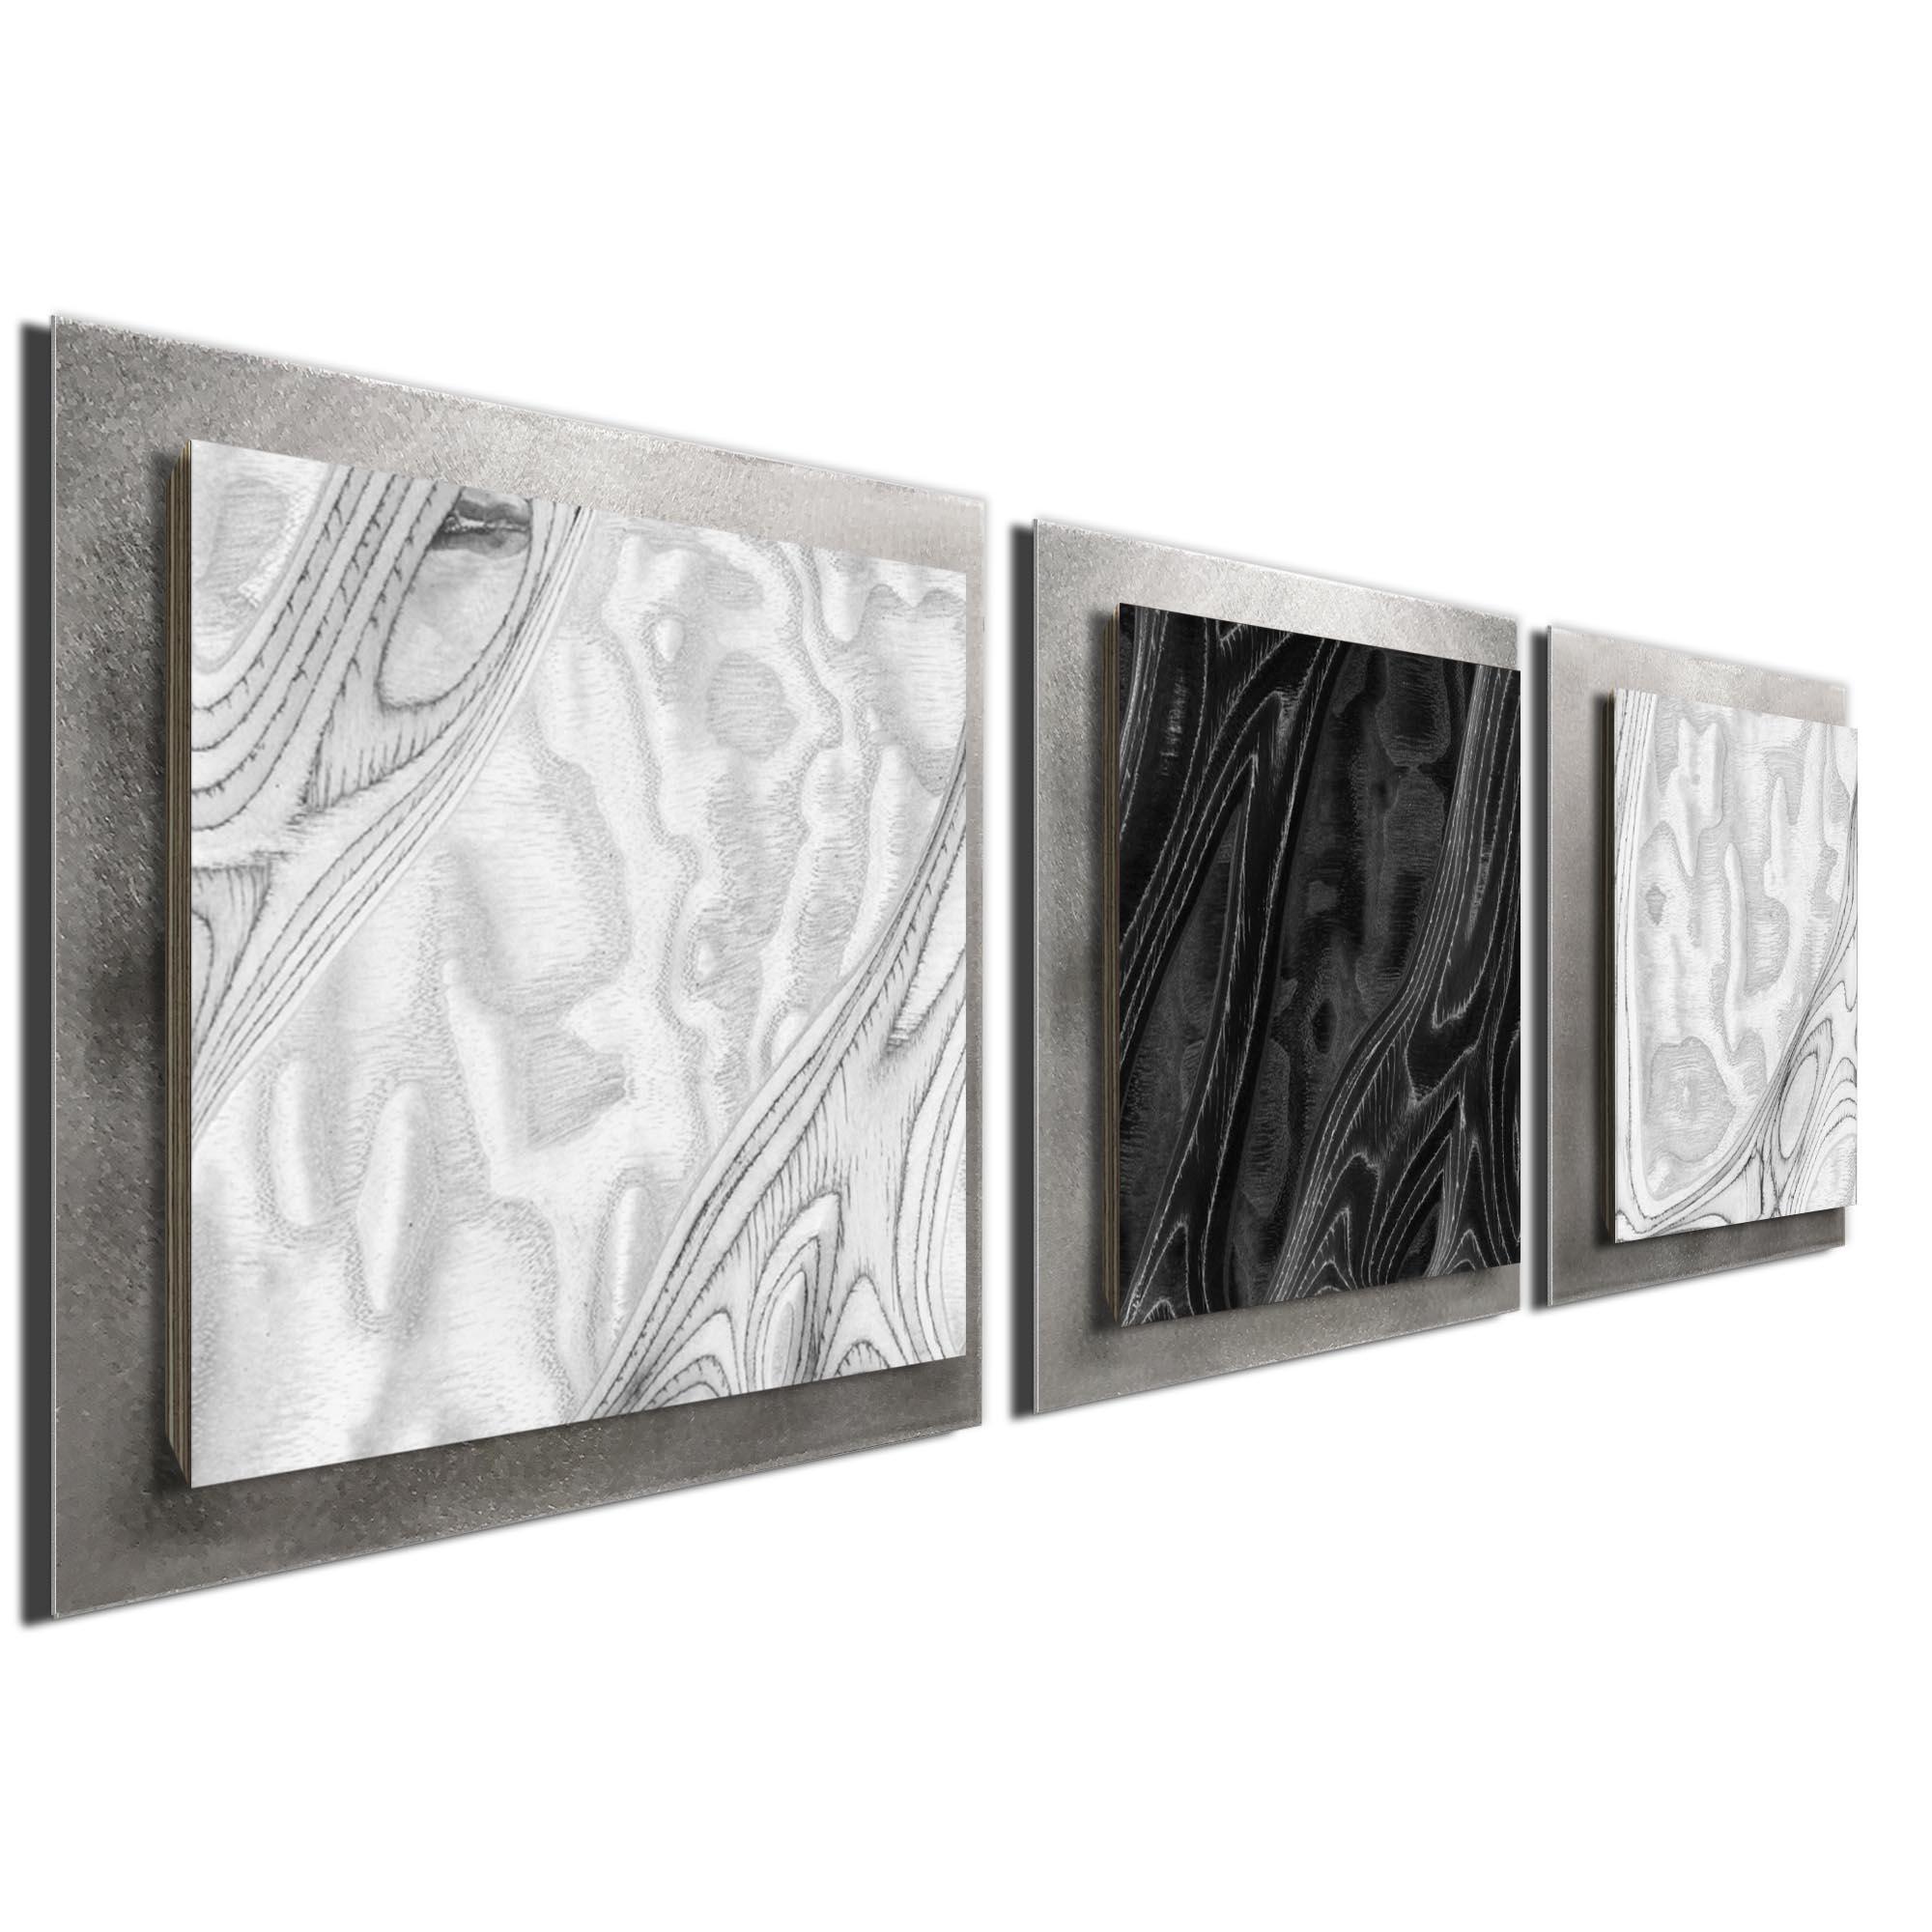 WBW Burl Essence Silver by Jackson Wright Rustic Modern Style Wood Wall Art - Image 2